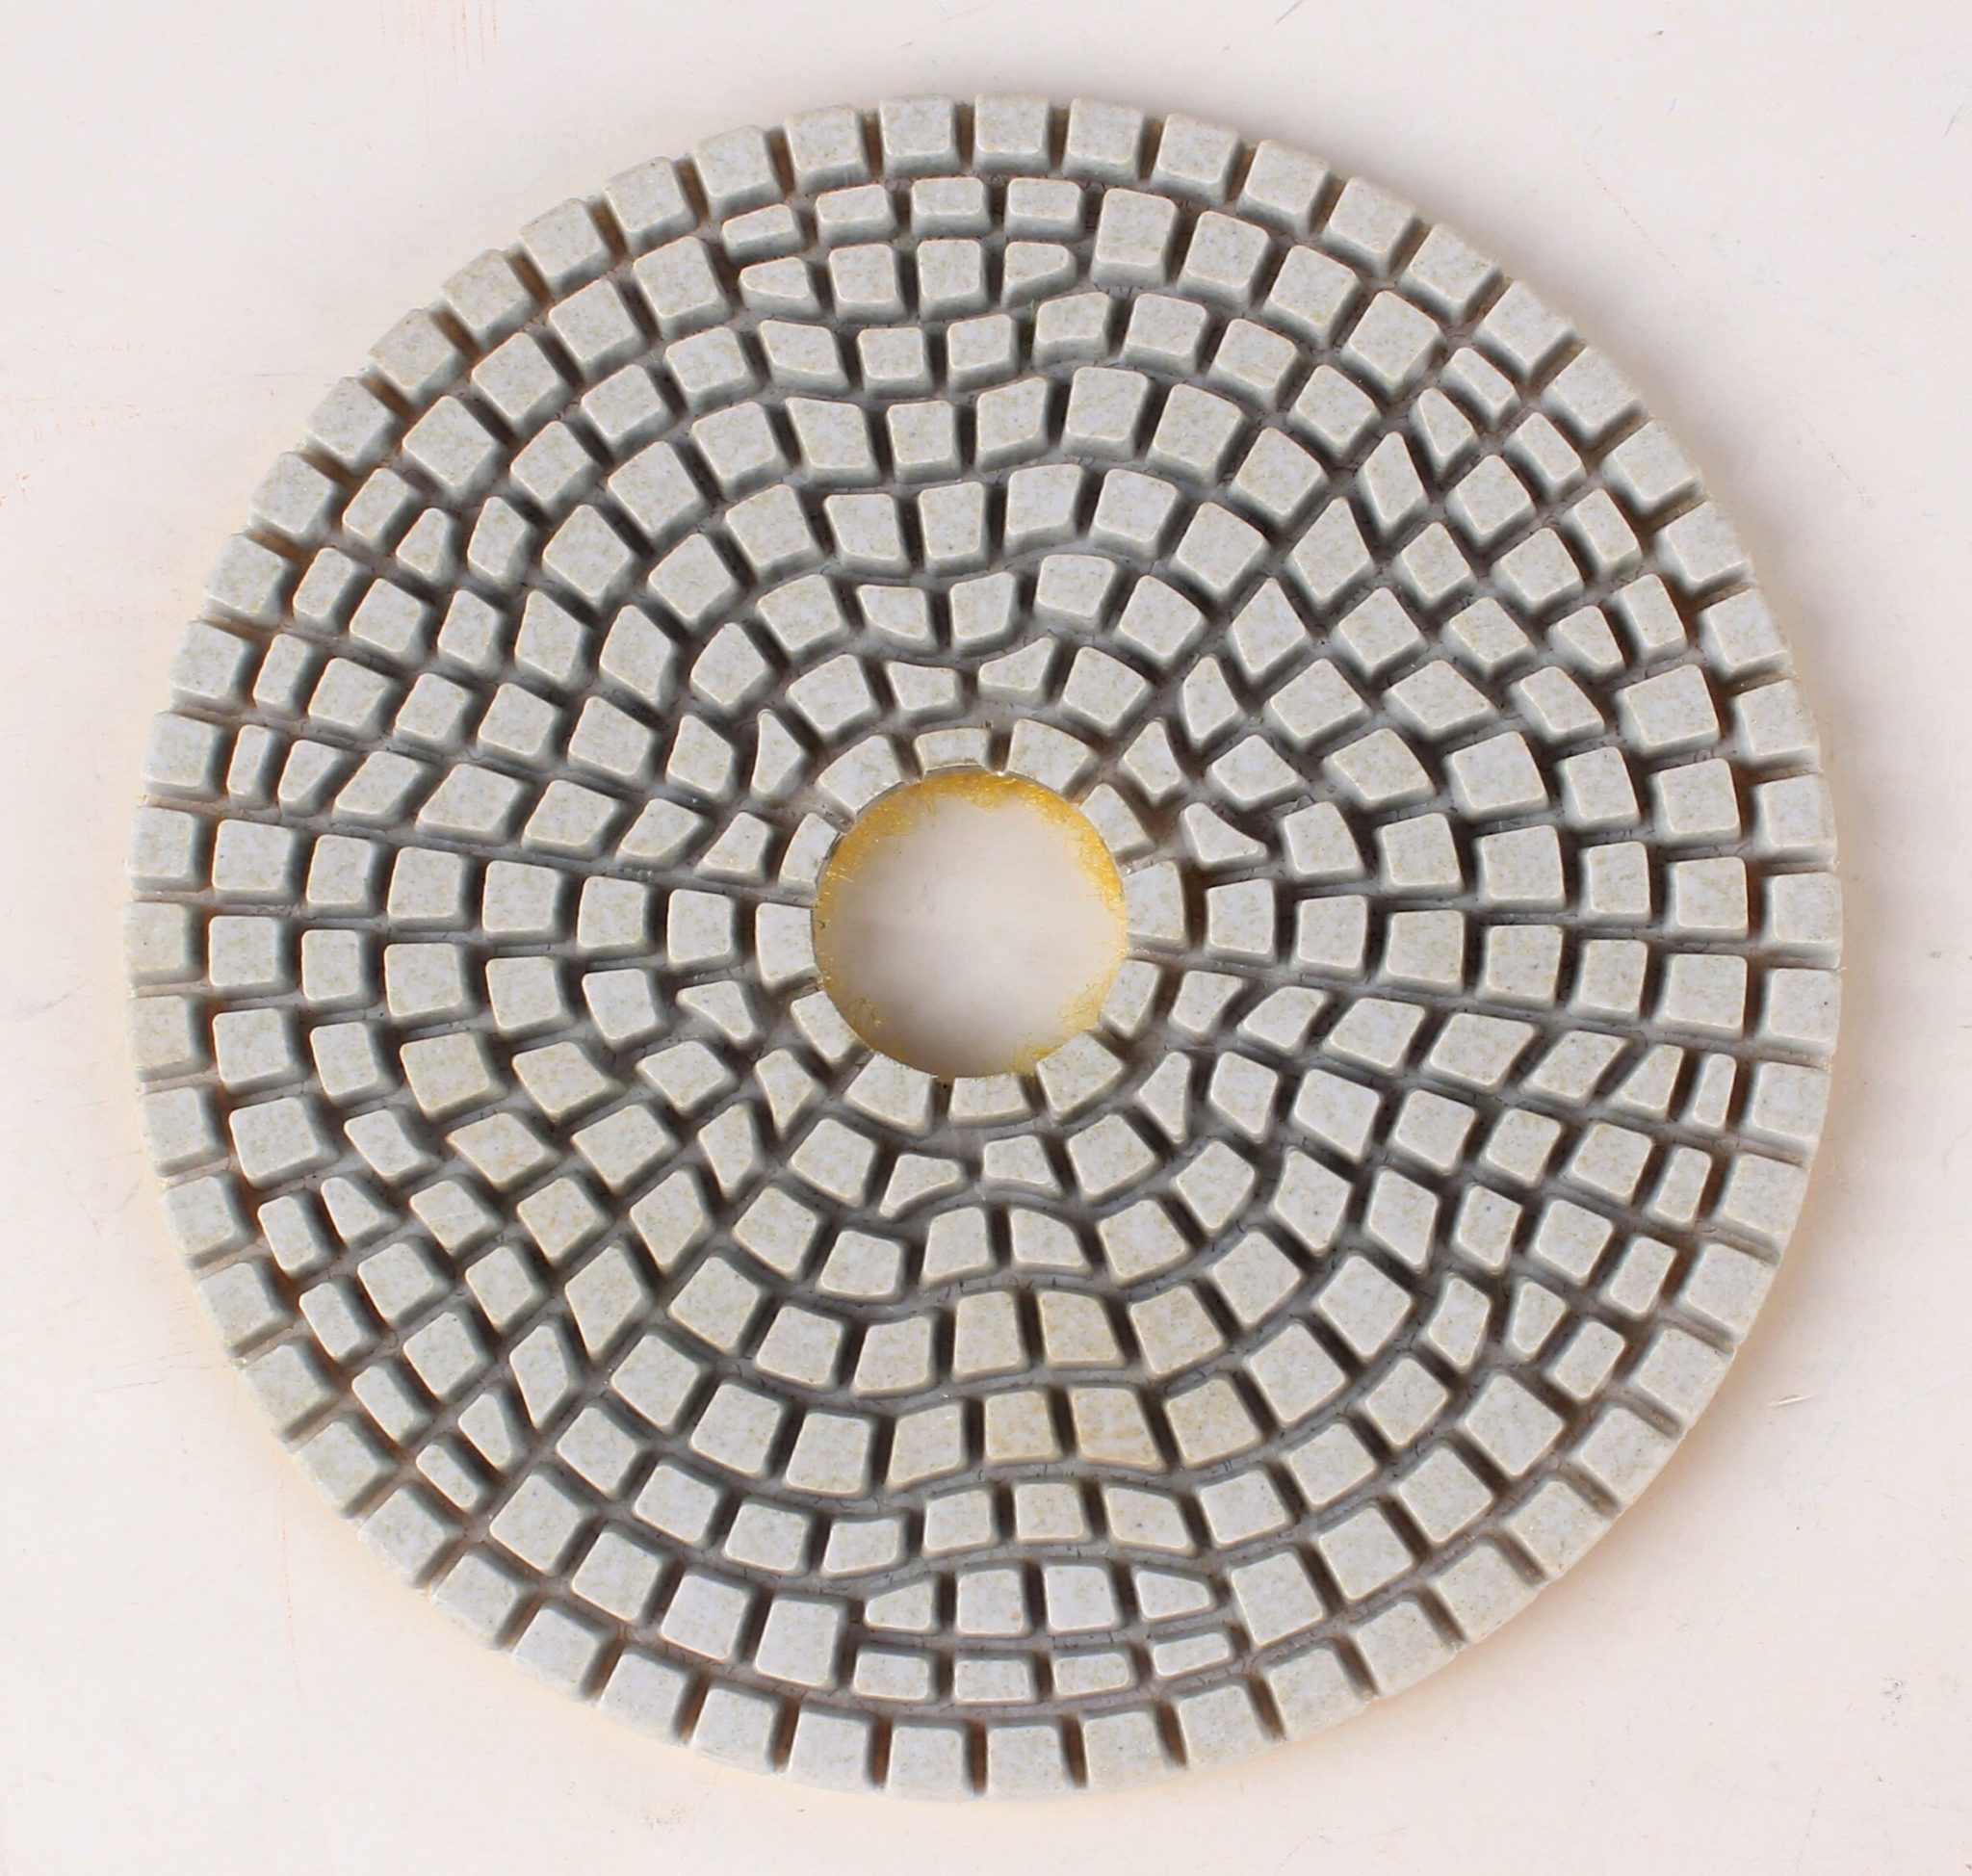 Raizi 4 Inch/100 mm 3 Step Polishing Pads Wet Marble, Engineered Stone, Granite Diamond Polishing Pads